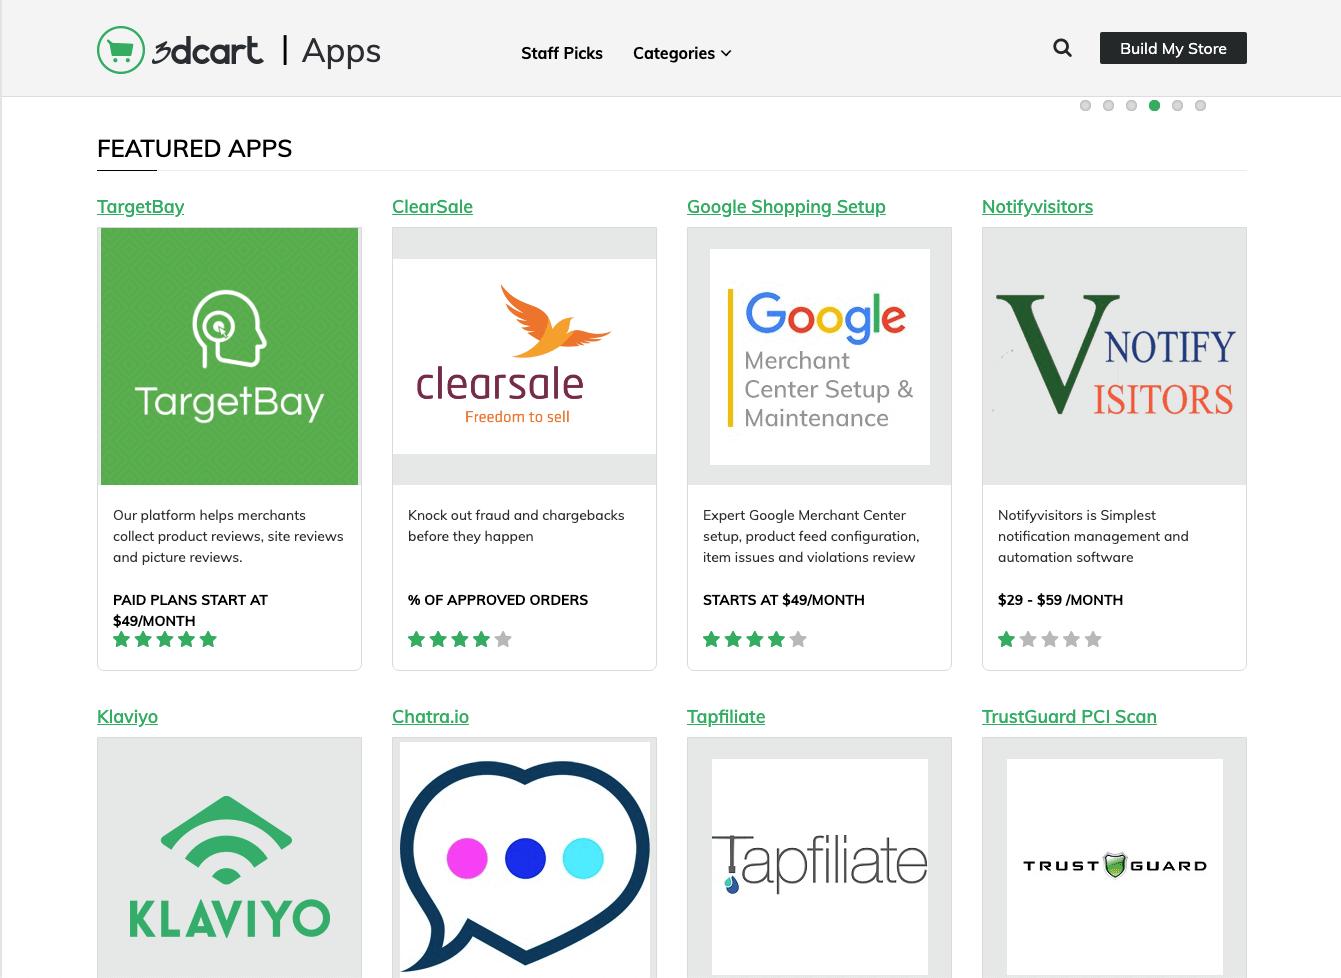 The 3dcart app store